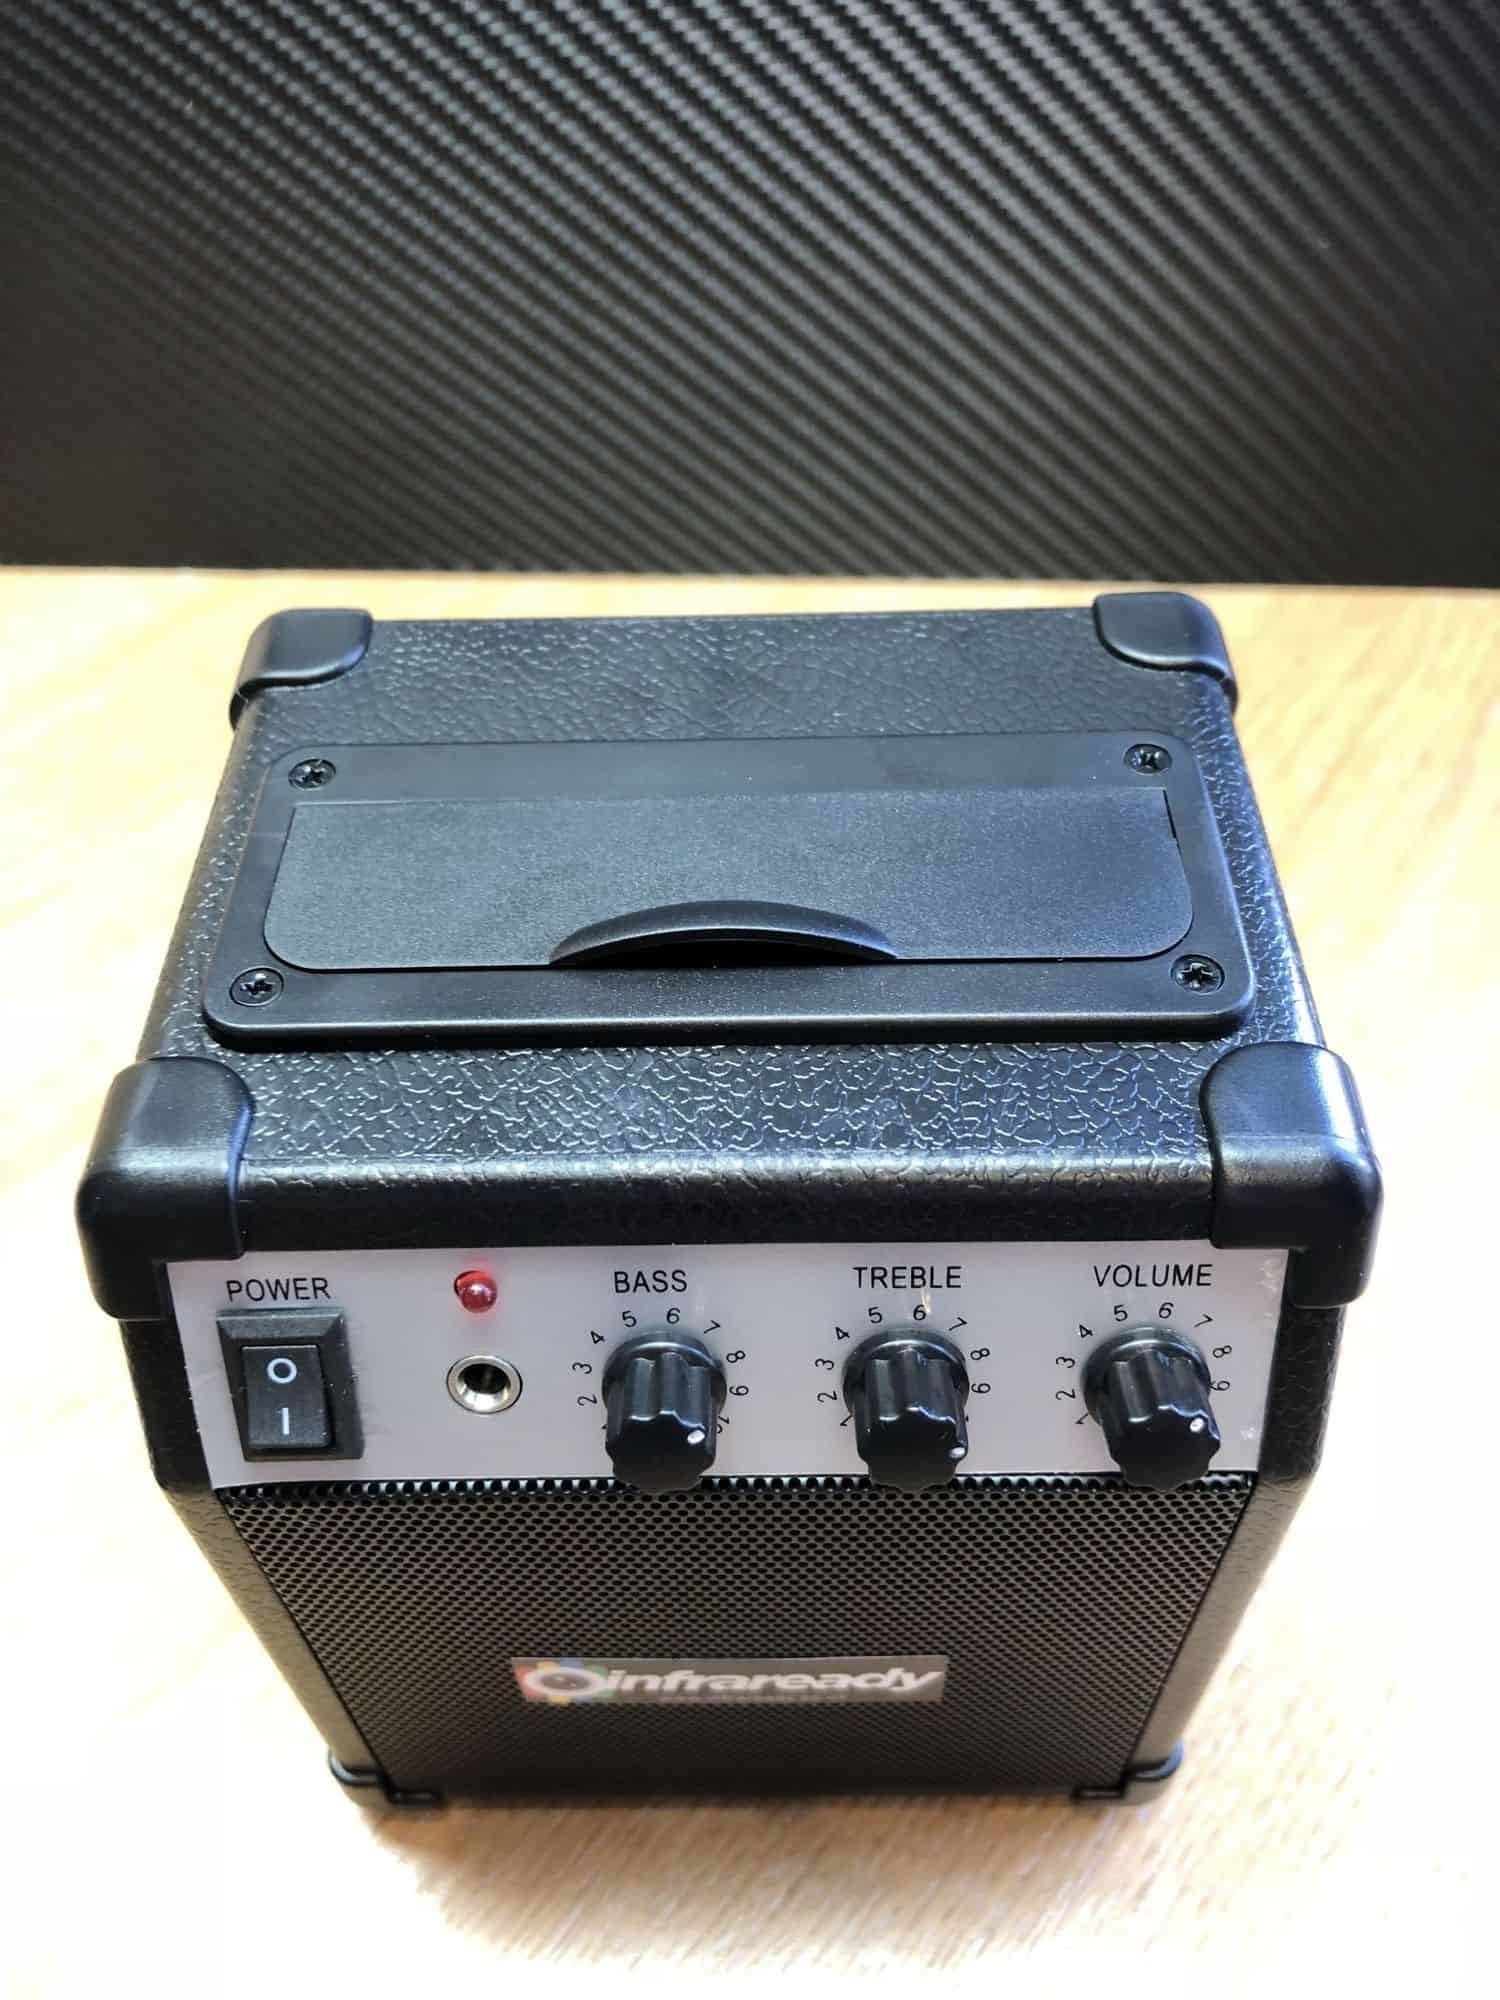 Psb7 Spirit box franks speaker sweep radio